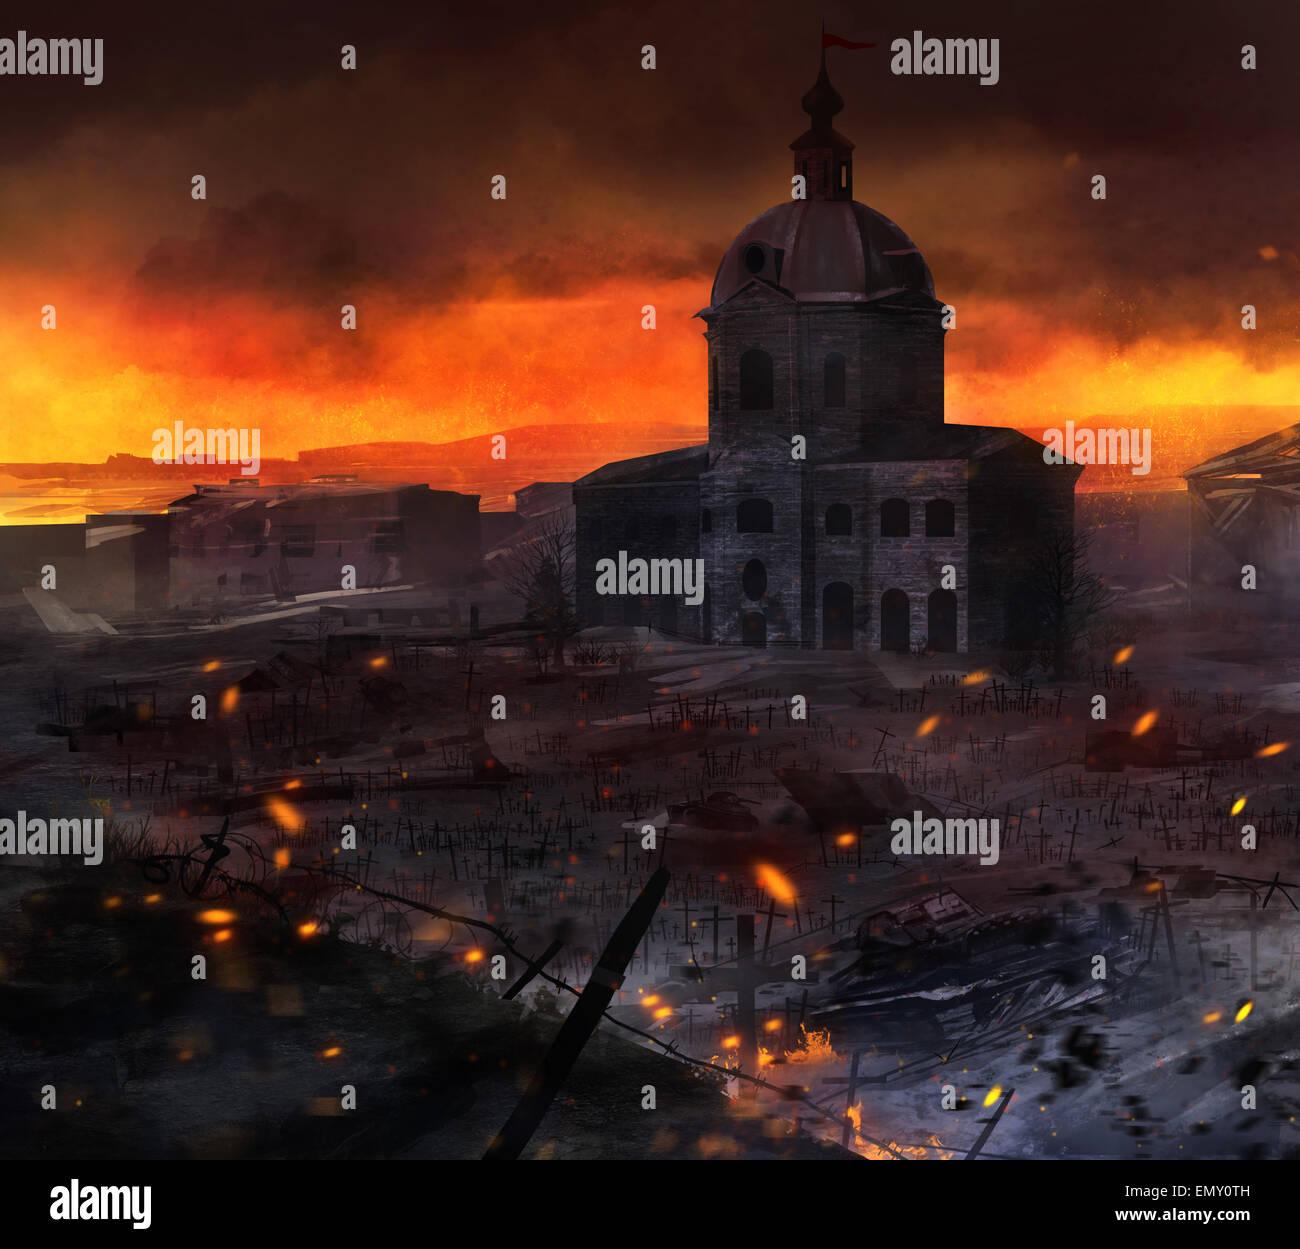 War field art. Illustrated post battle scene with tanks, church & grave crosses background artwork. - Stock Image